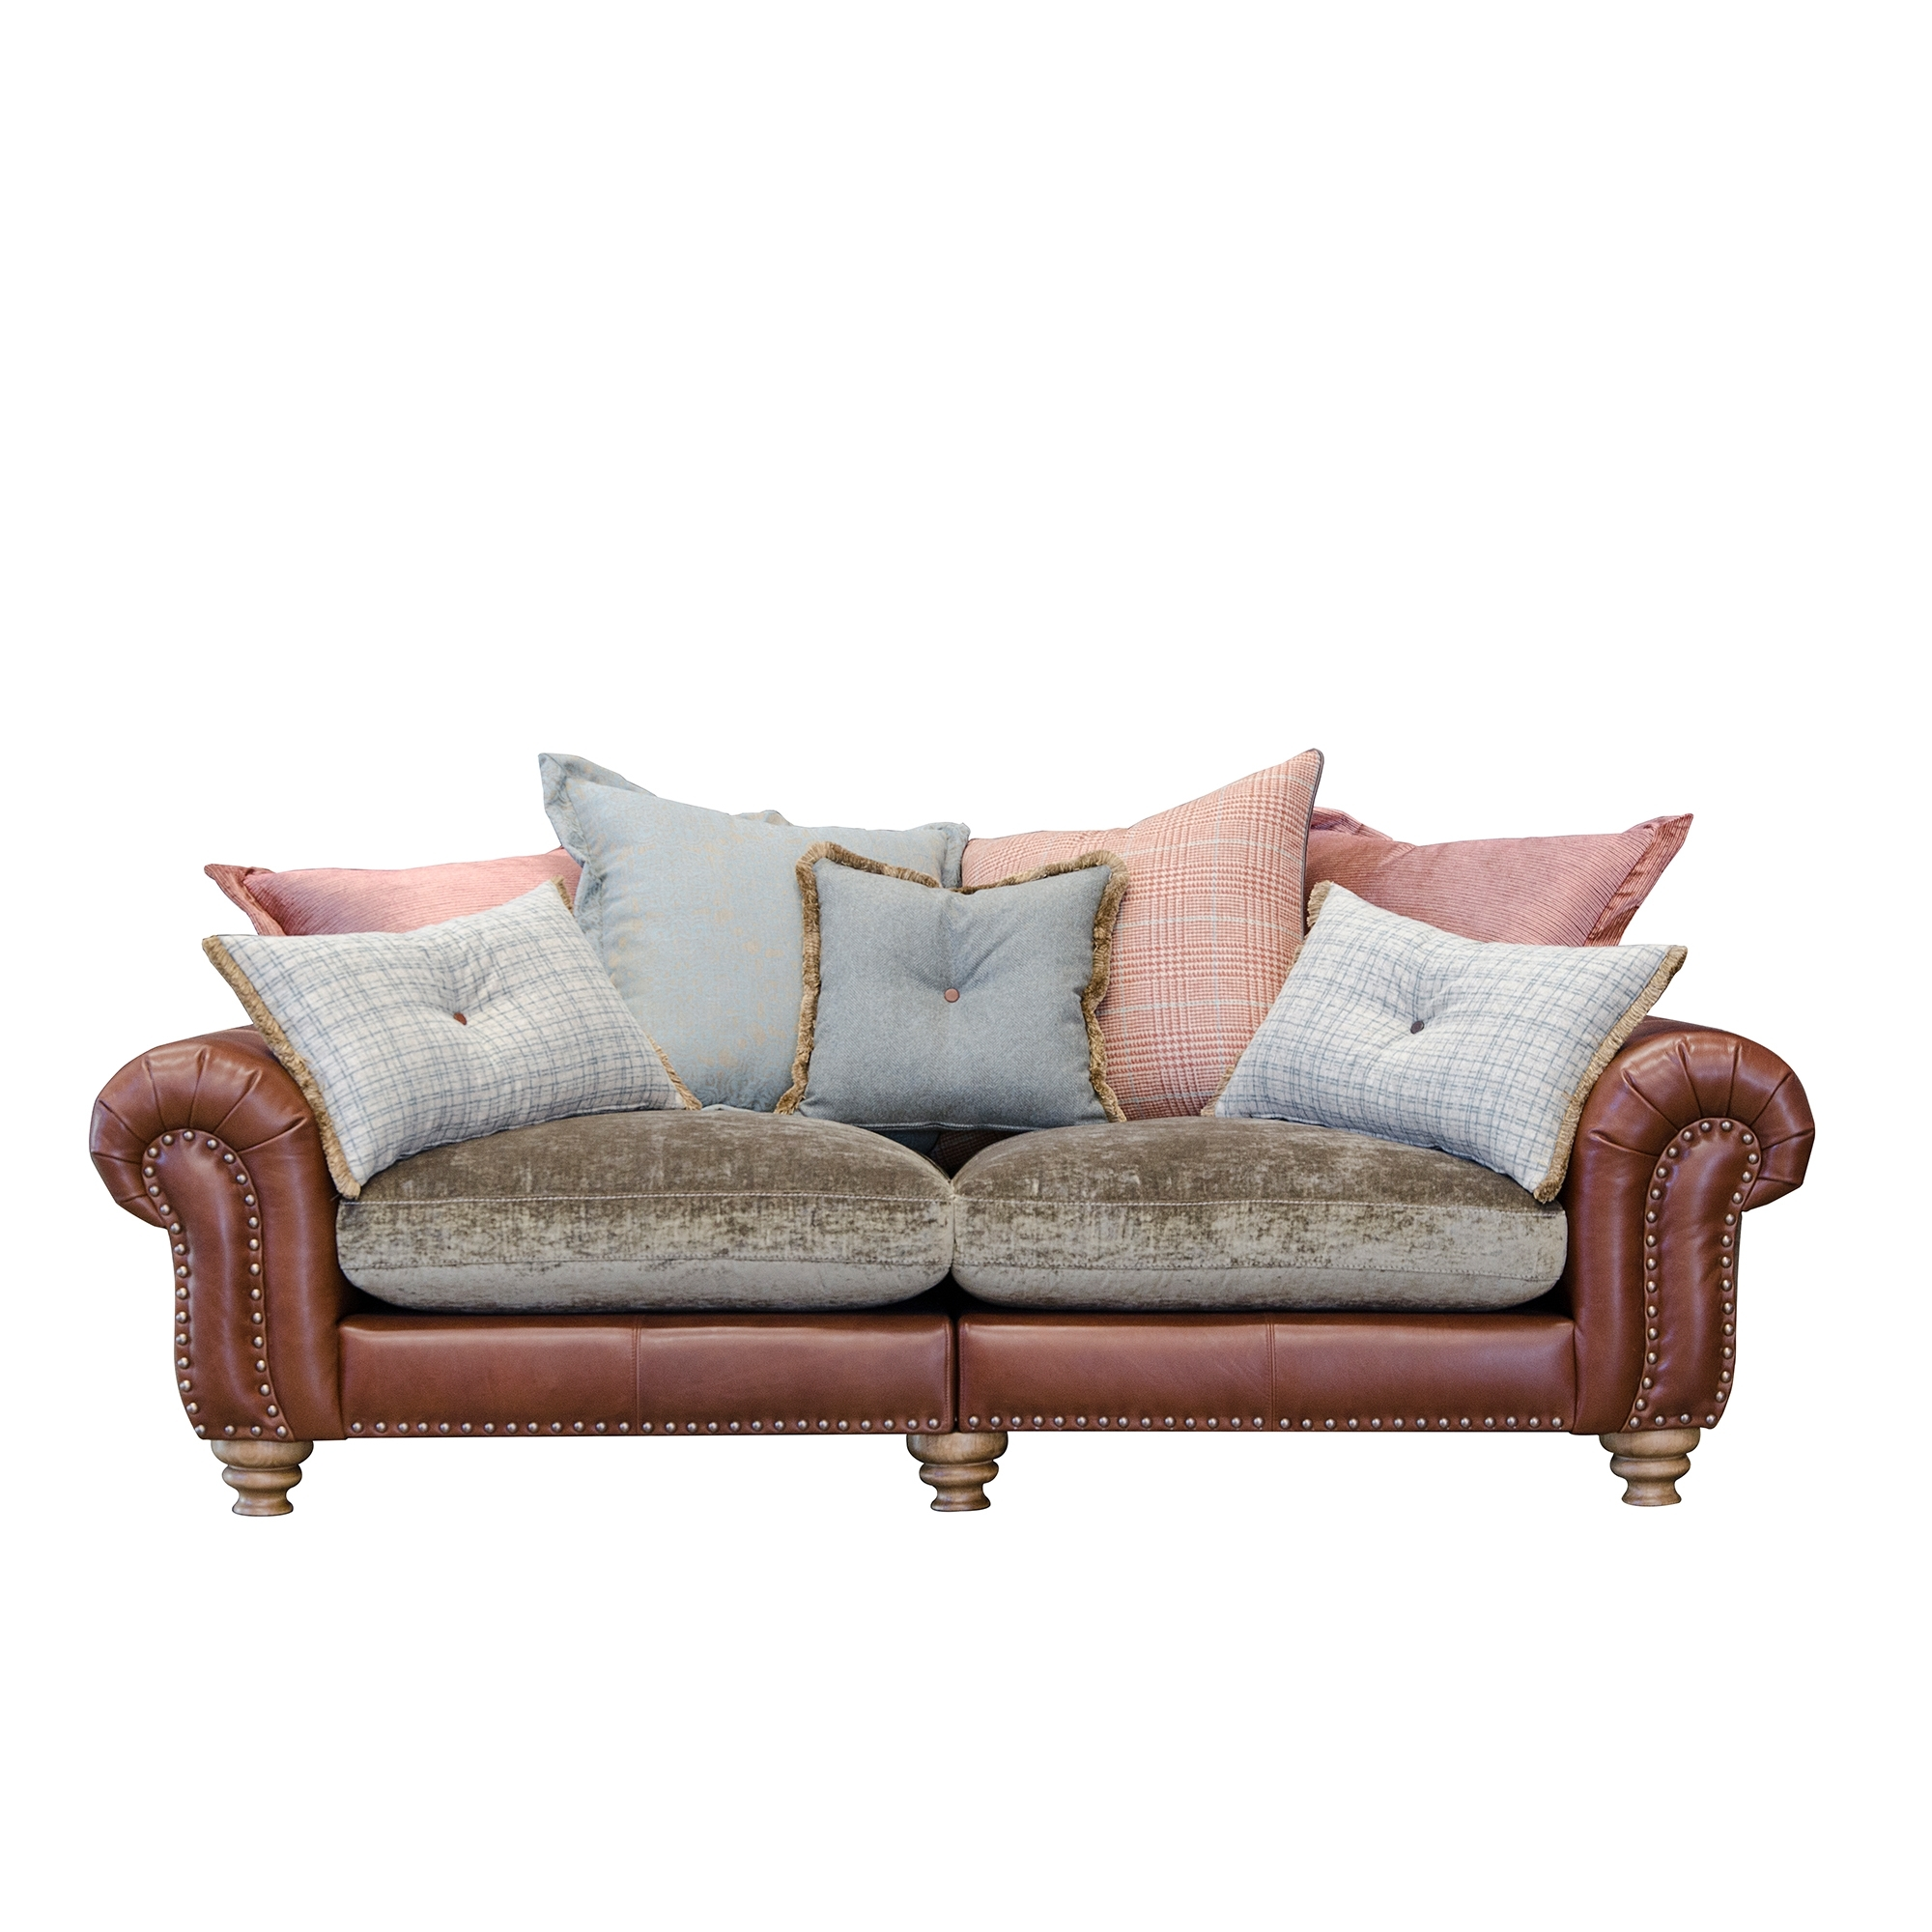 Beau Alexander And James Bloomsbury Large Split Sofa